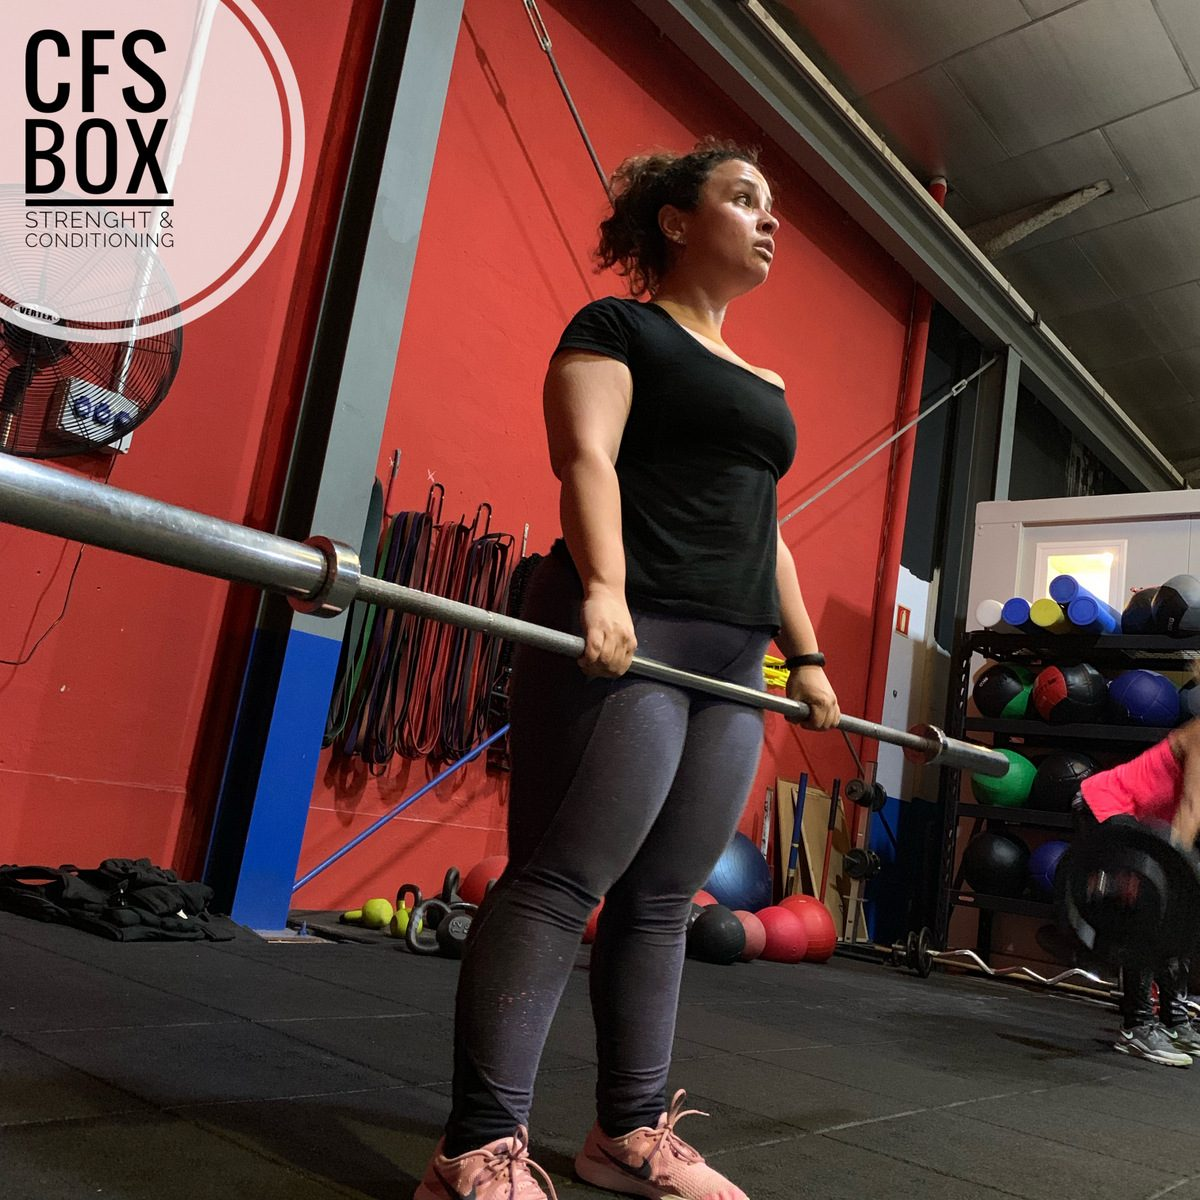 Wod CFS Box CrossFit Sevilla training lions leonas